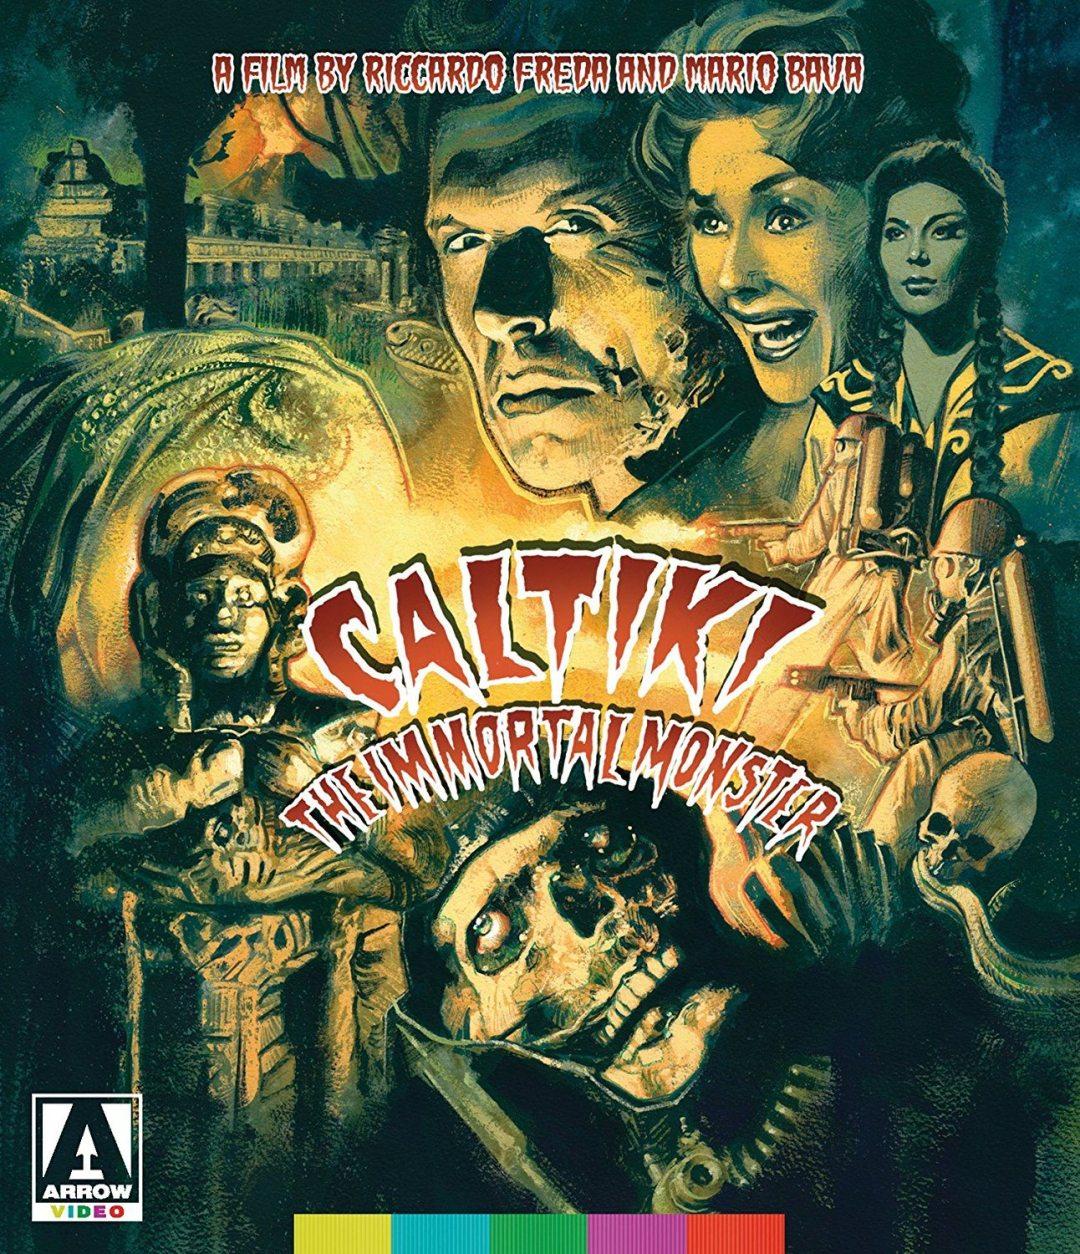 Caltiki – Blu-ray/DVD Review